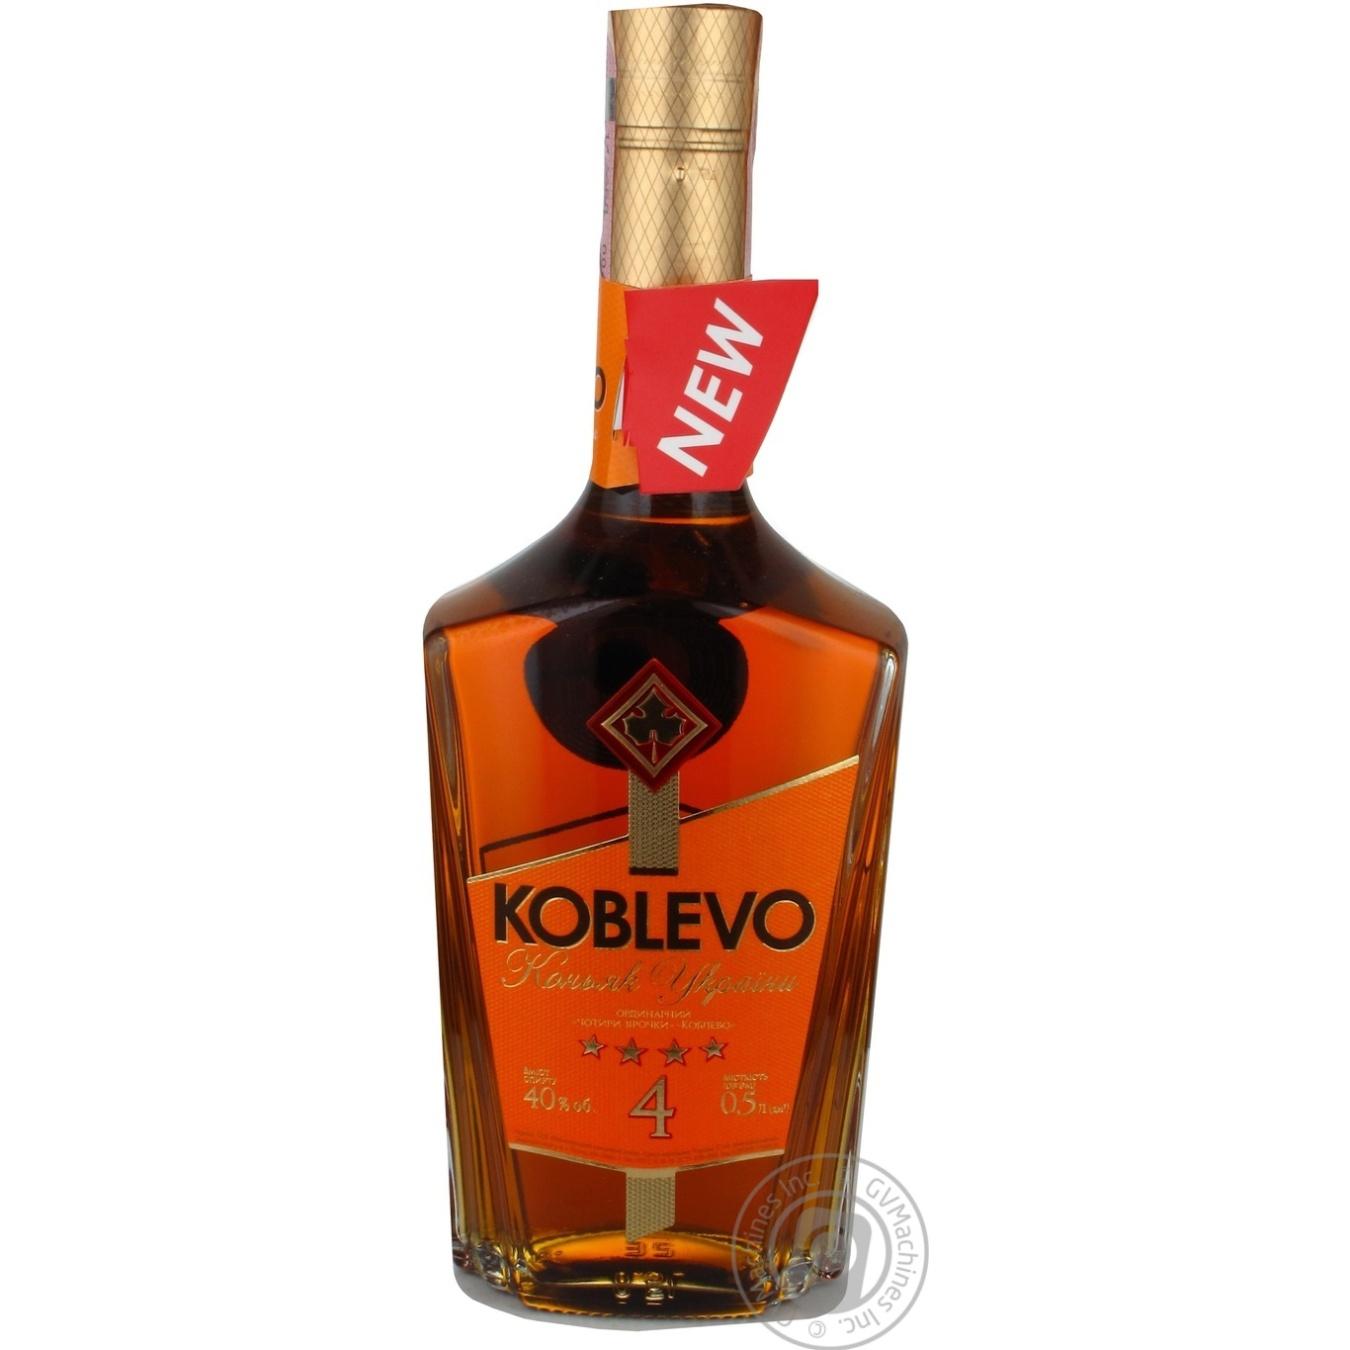 KOBLEVO КОНЬЯК УКР ОРД 4* 0,5